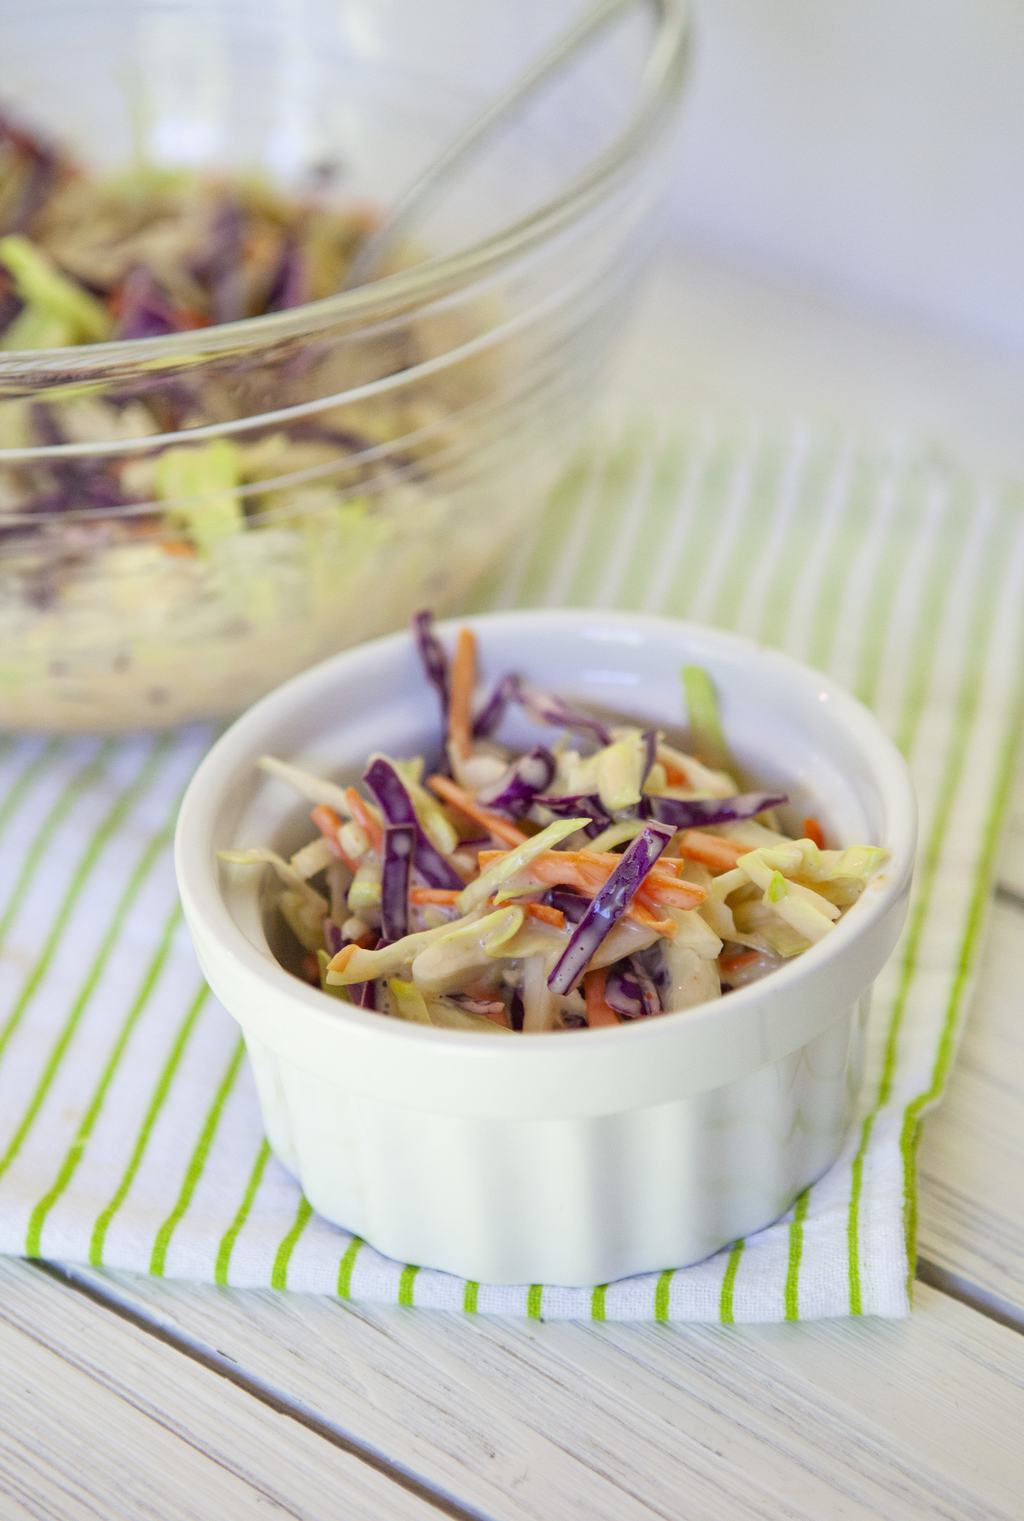 spicy cabbage coleslaw